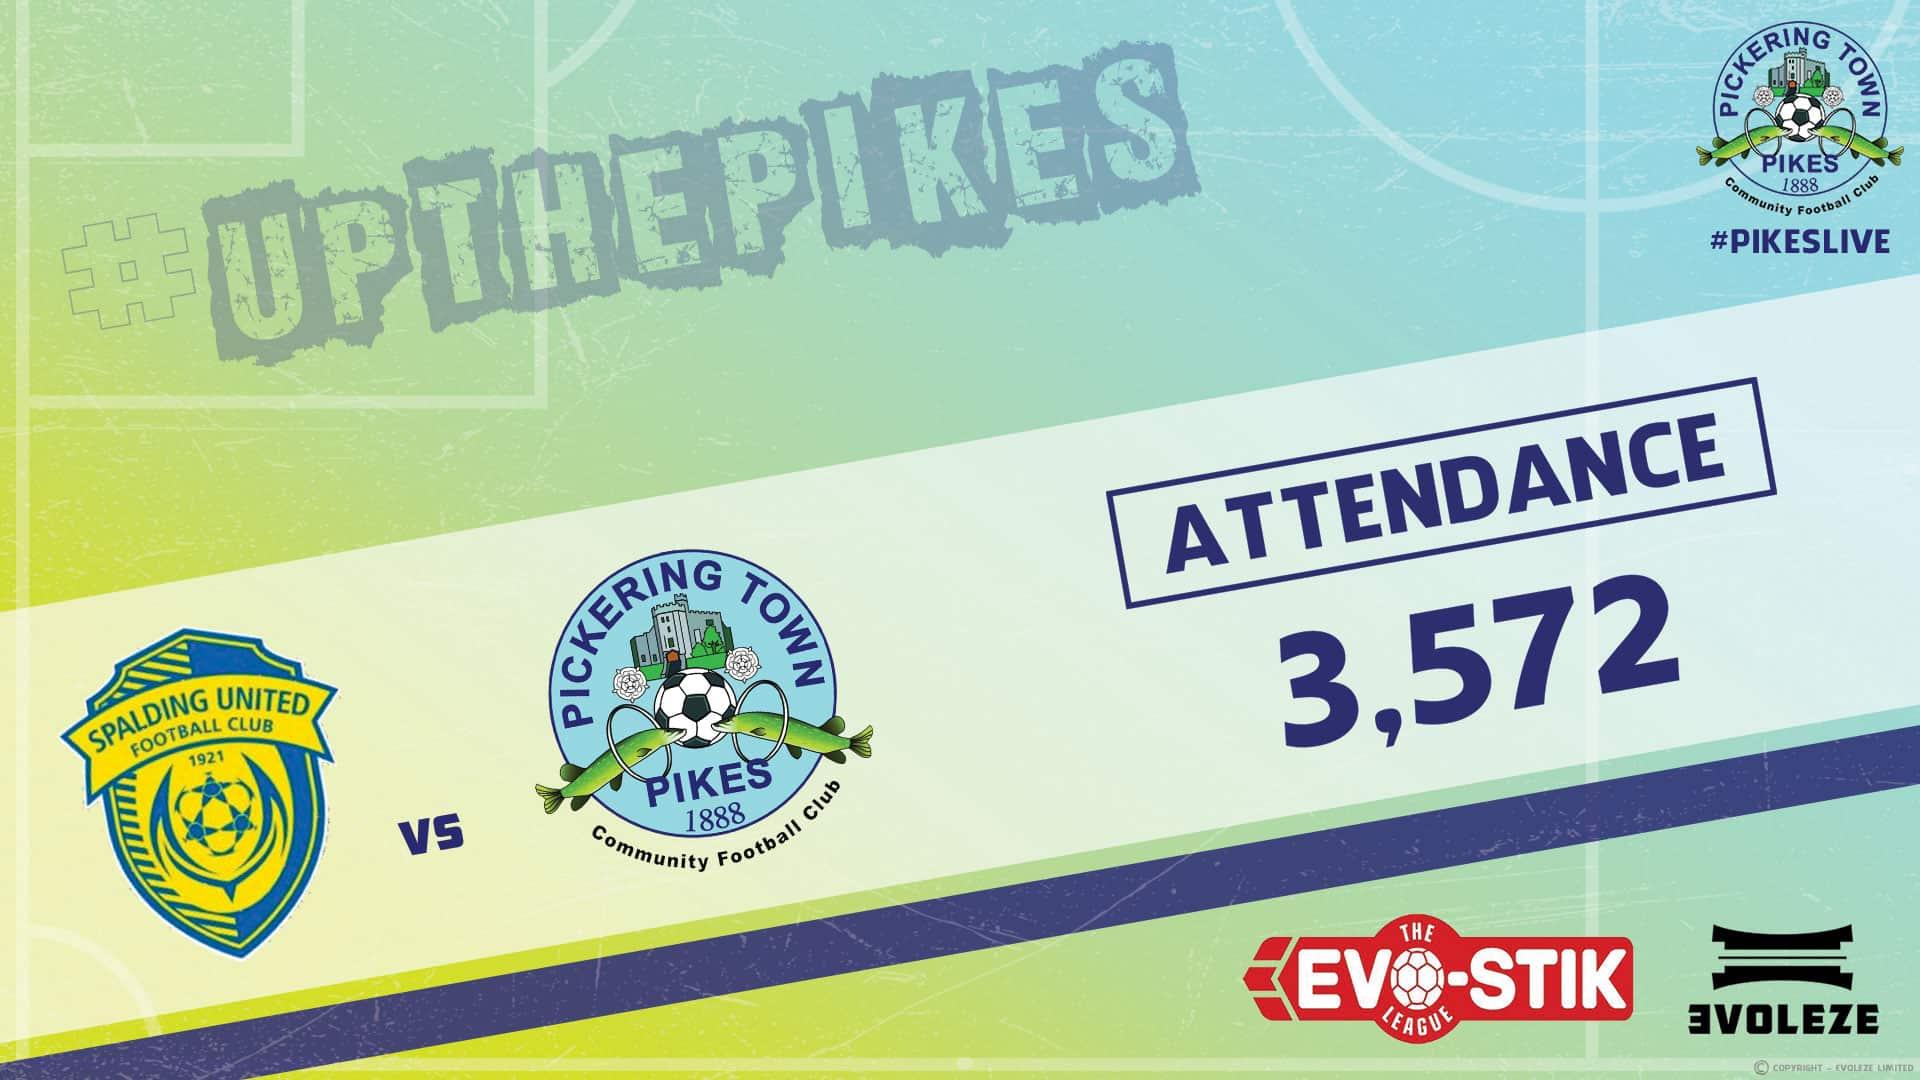 attendance - Pickering Town FC